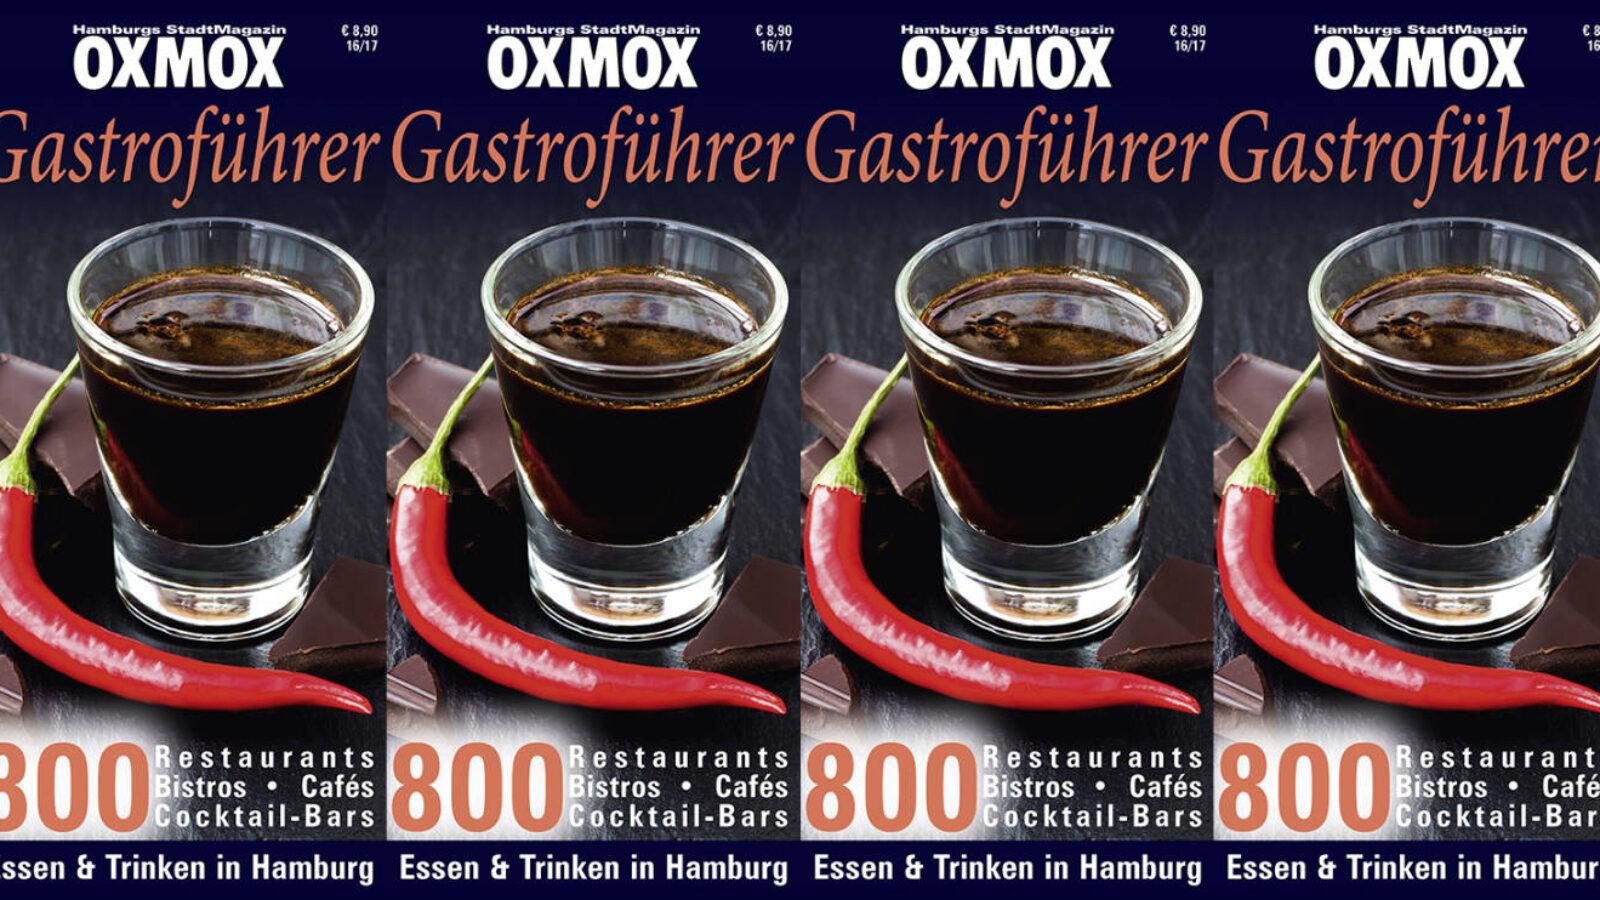 OXMOX Gastronomie Tipp: Dionysos